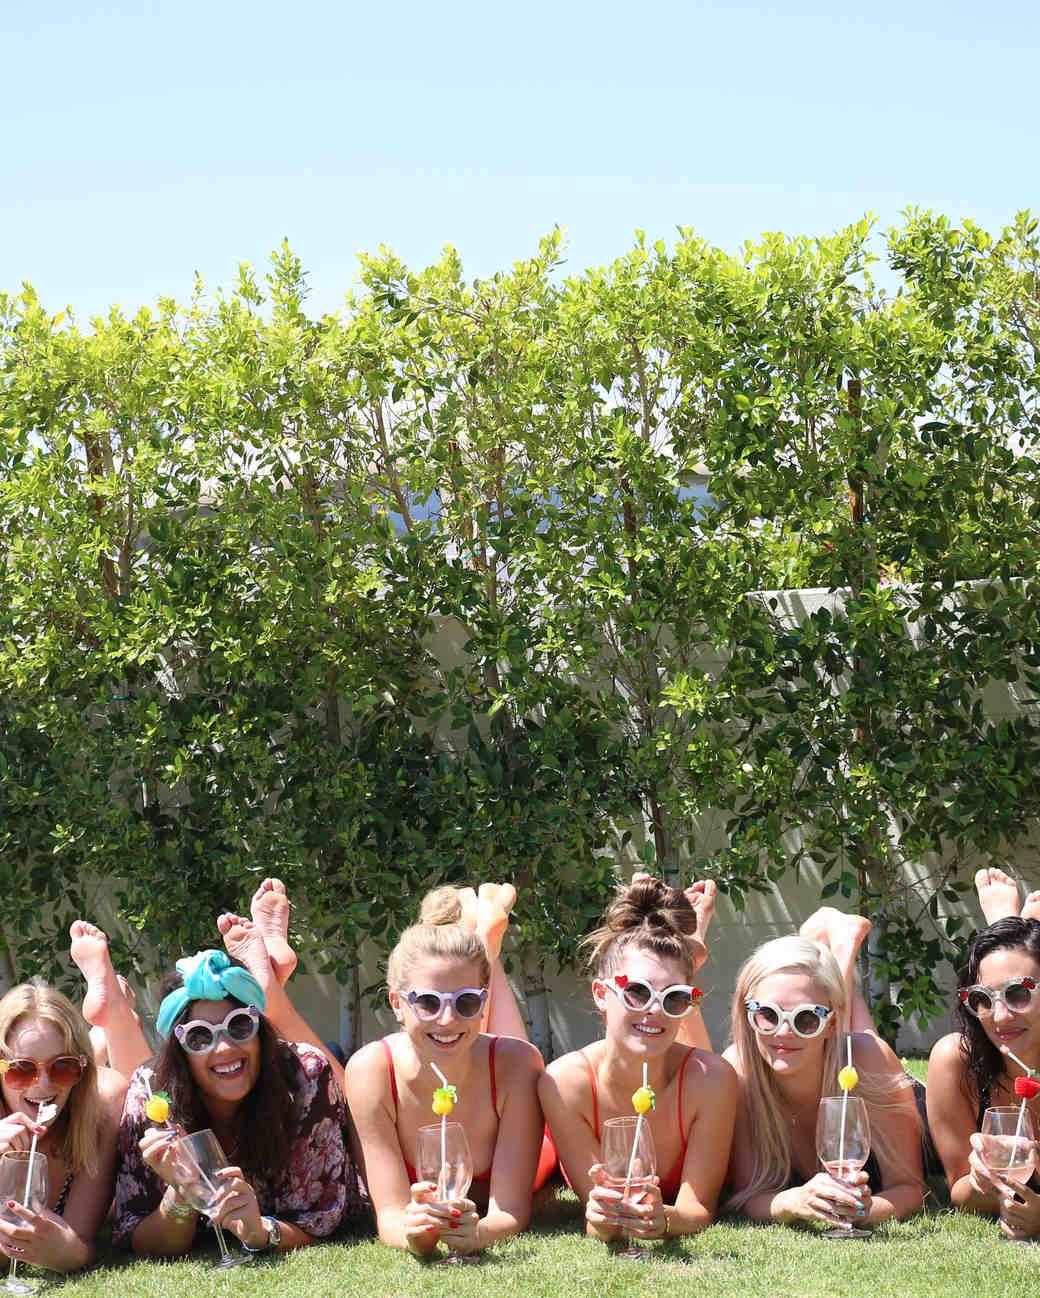 Girls flash in their bikinis